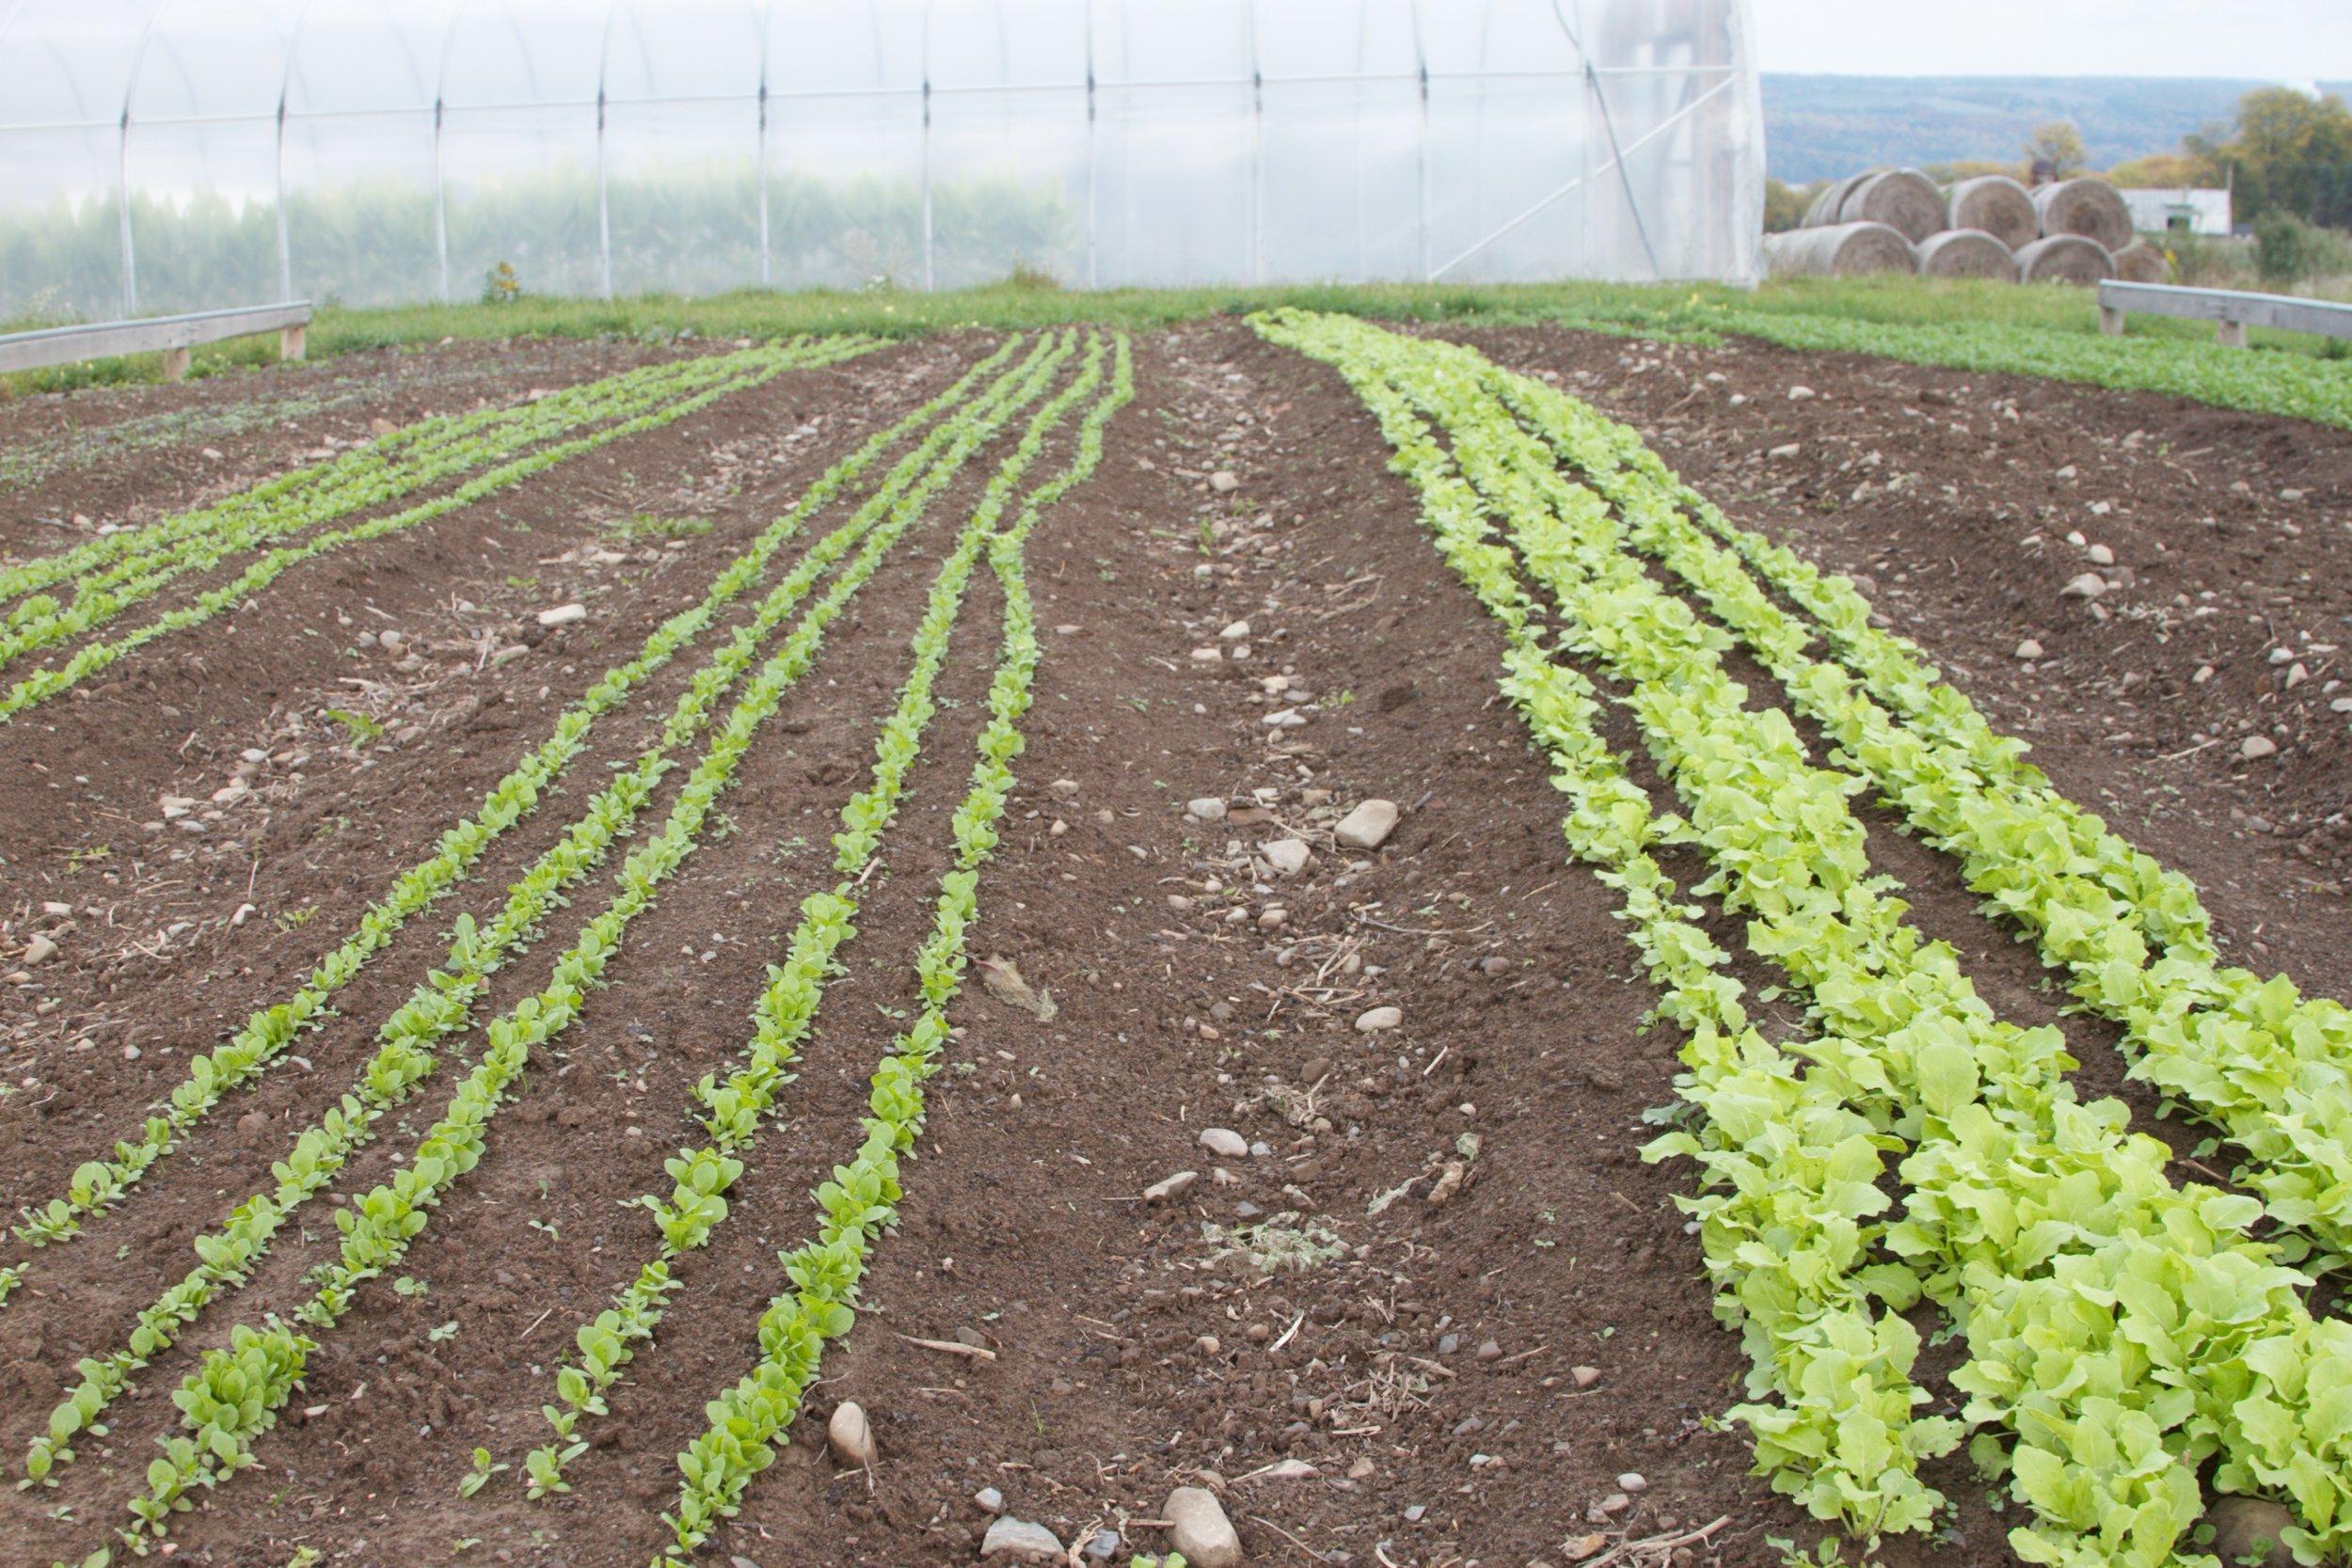 Salad greens, weed-free in chocolate-cake soil